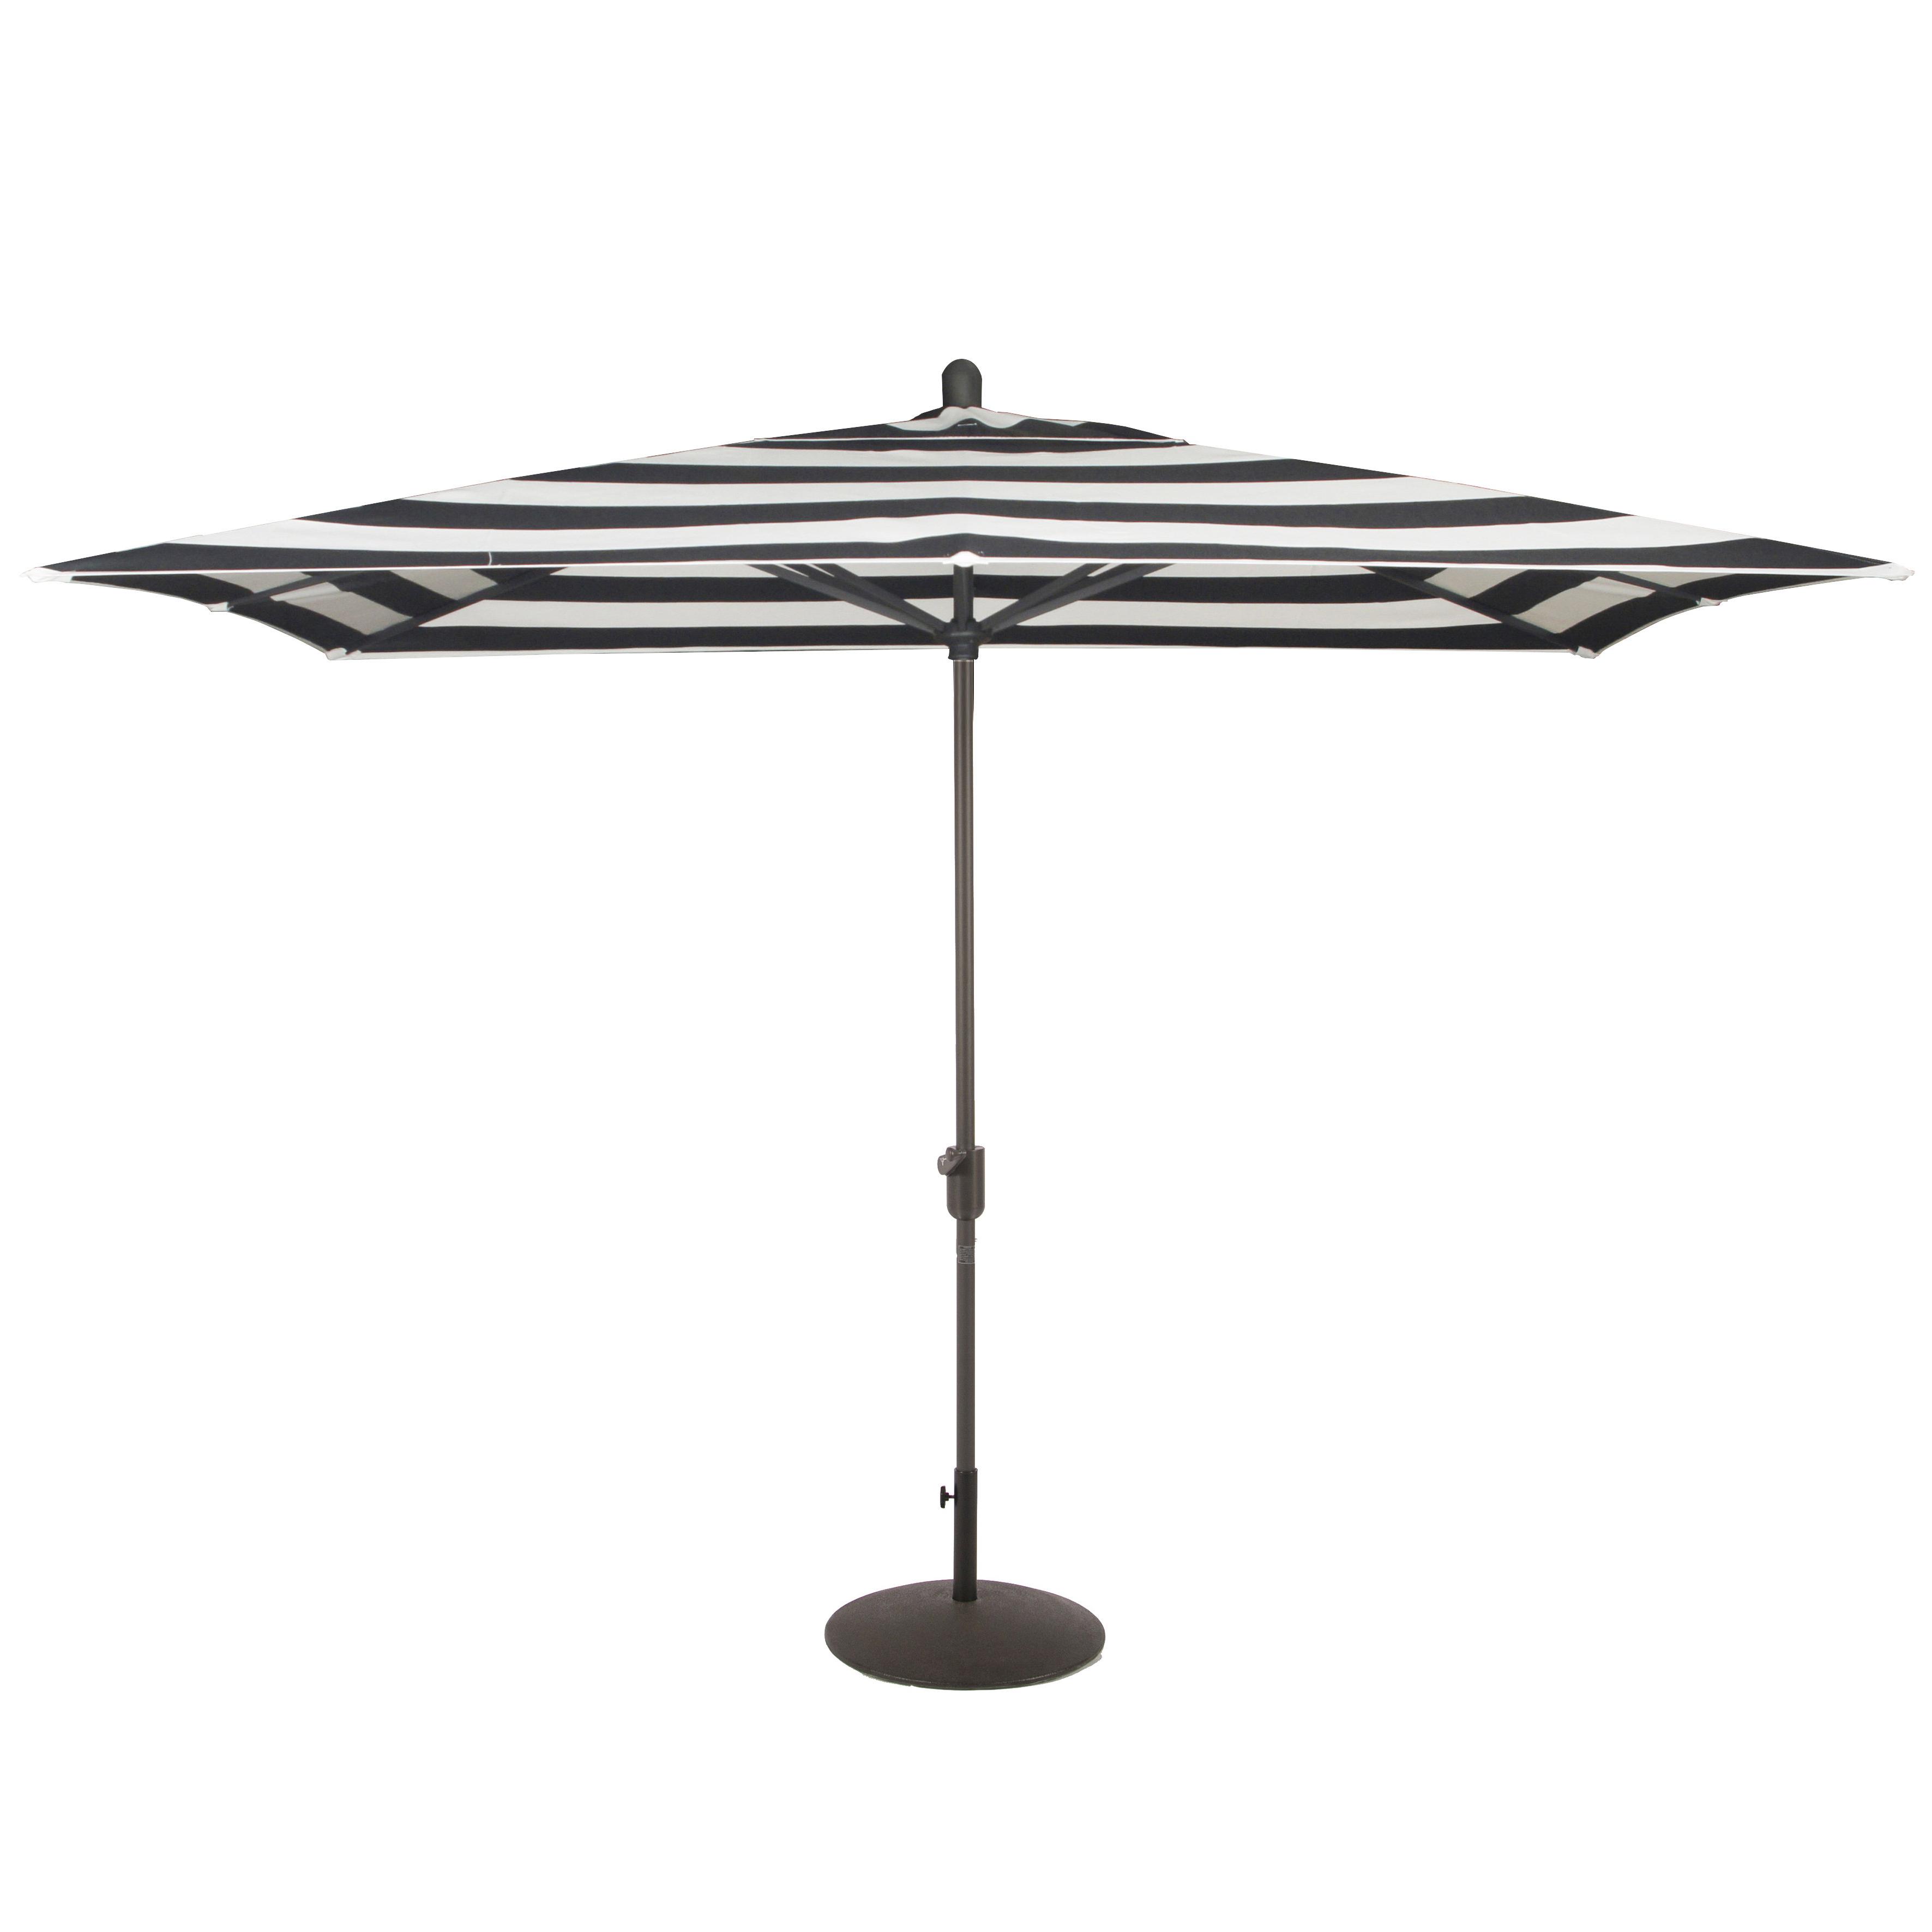 Latest Darwen Tiltable Patio Stripe Market Umbrellas With Wieczorek Auto Tilt 10' X 6.5' Rectangular Market Sunbrella Umbrella (Gallery 11 of 20)